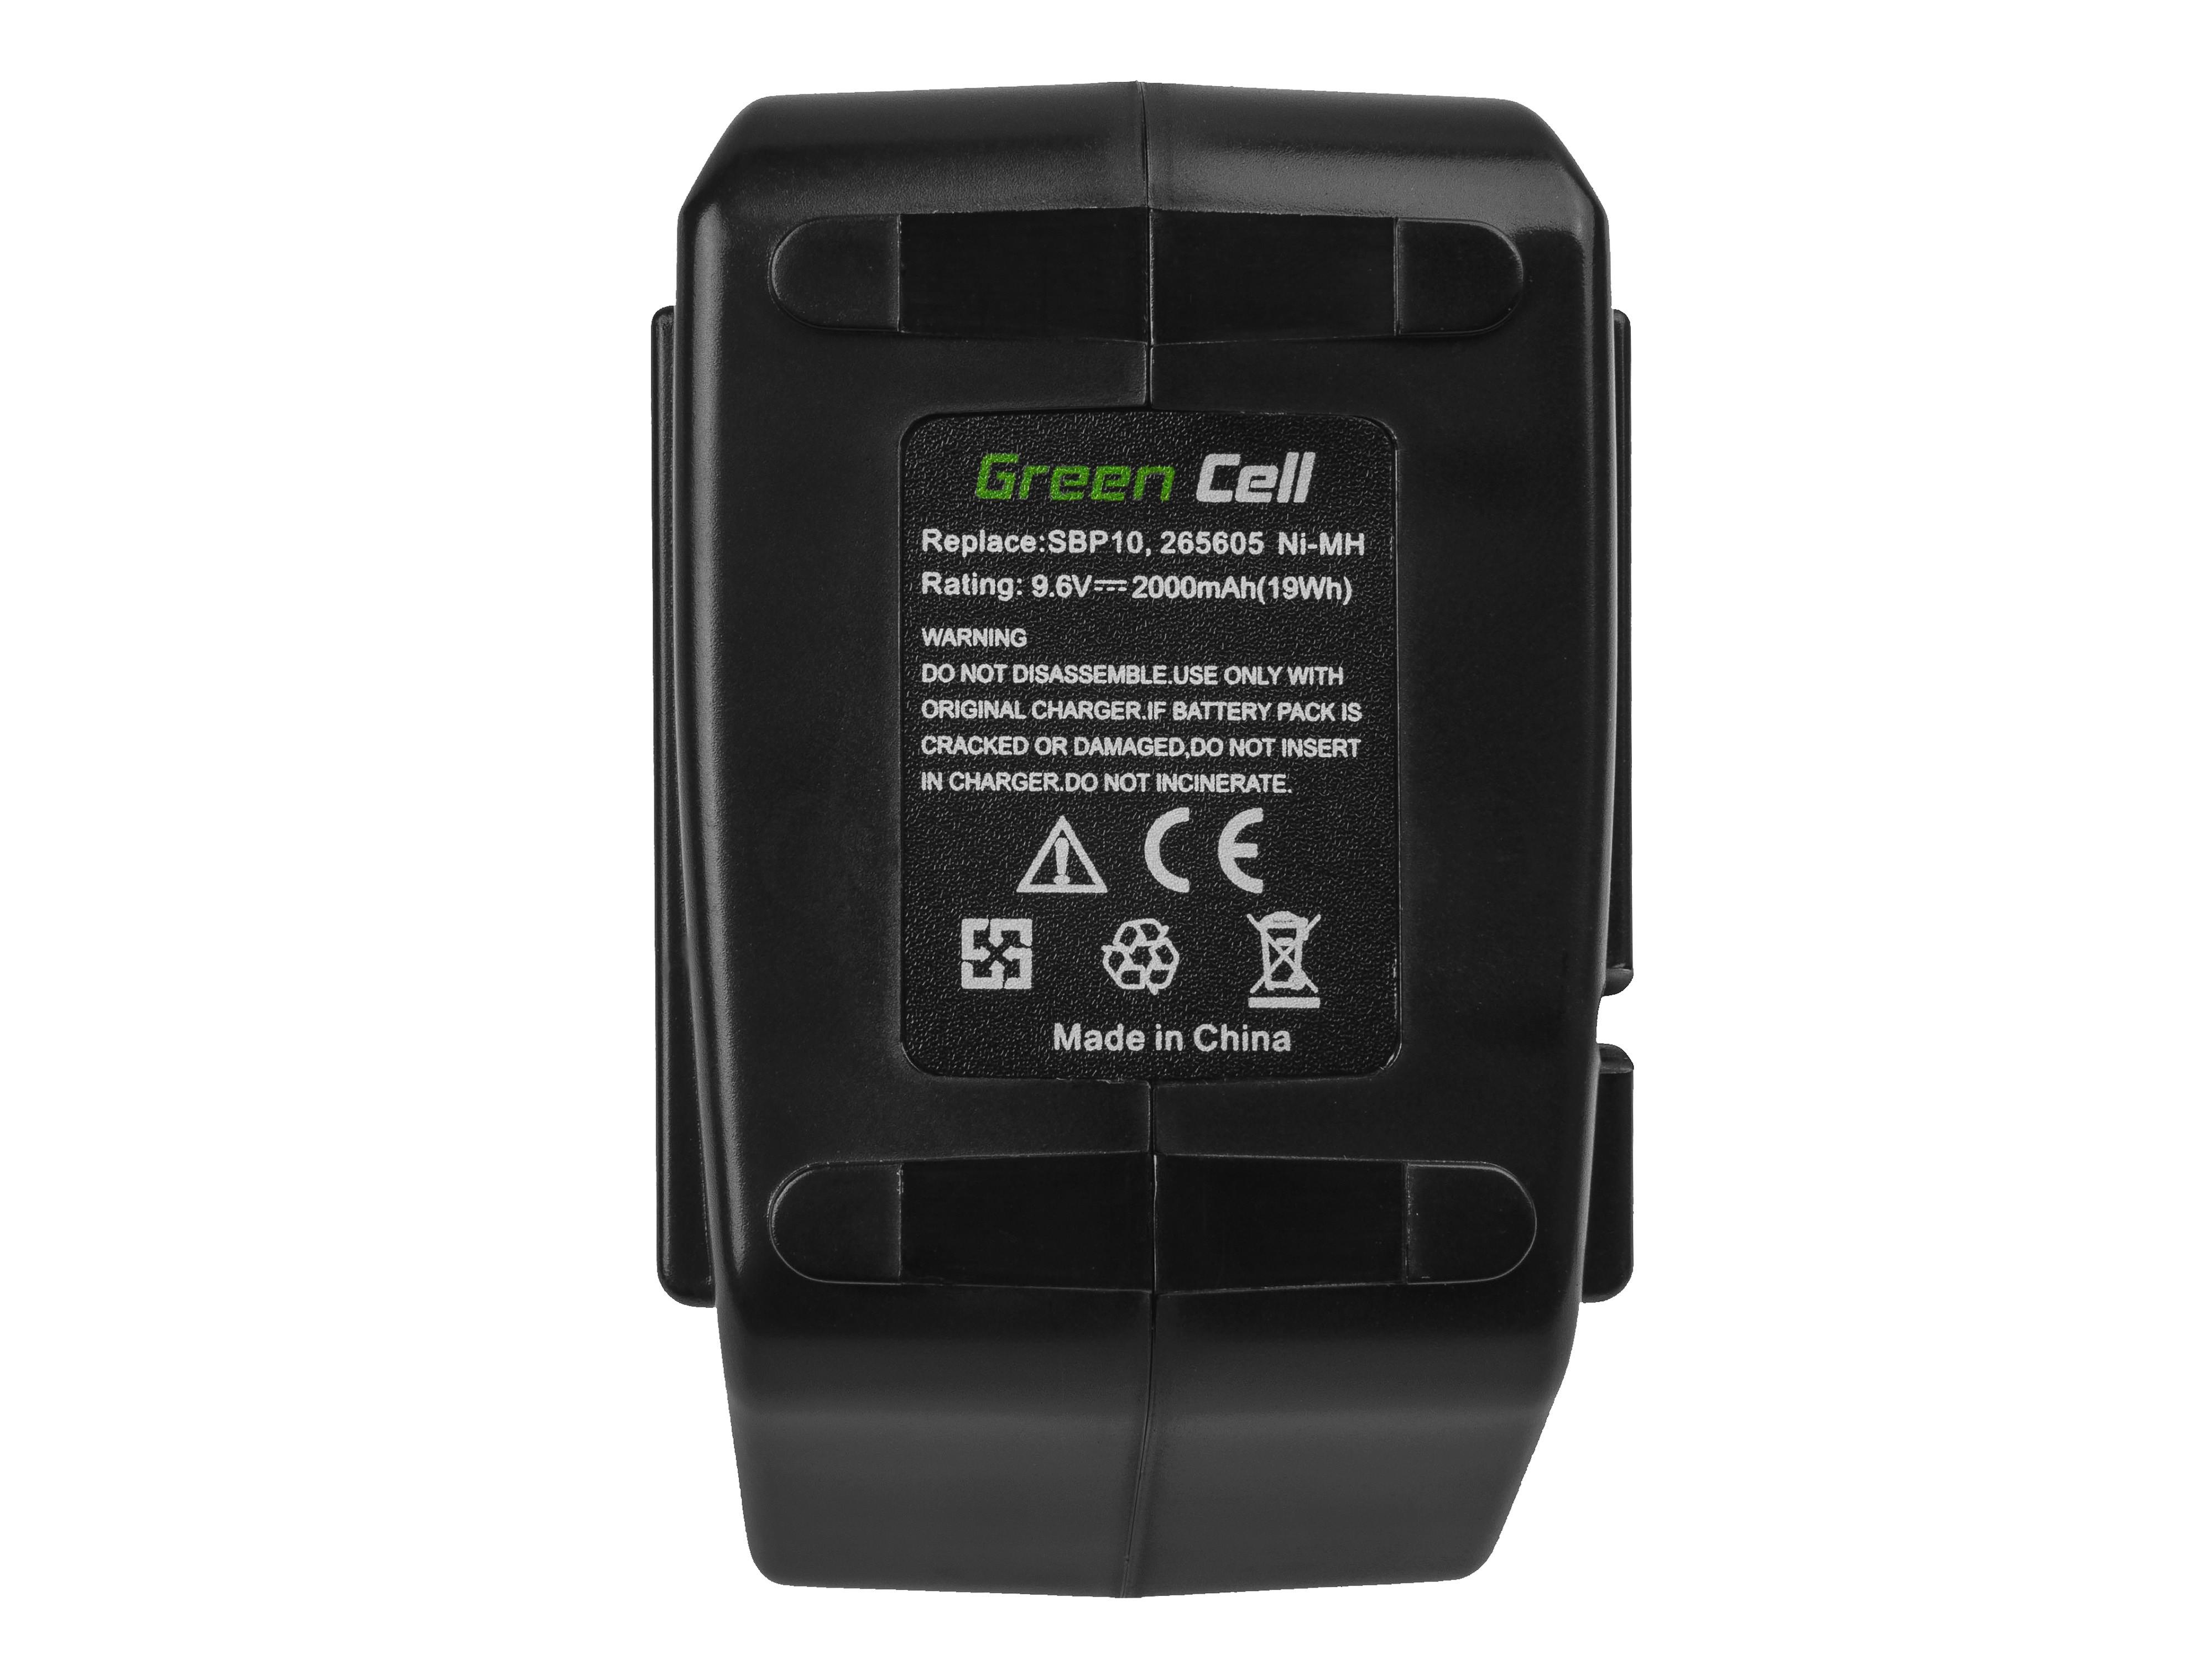 Green Cell PT244 Baterie Hilti SBP 10 SBP10 SFB 105 SFB105 265605 SBP-10 SPB10, Hilti SB 10 SB10 SF-100A BD2000 SB-10 SF 100A 2000mAh Ni-MH - neoriginální